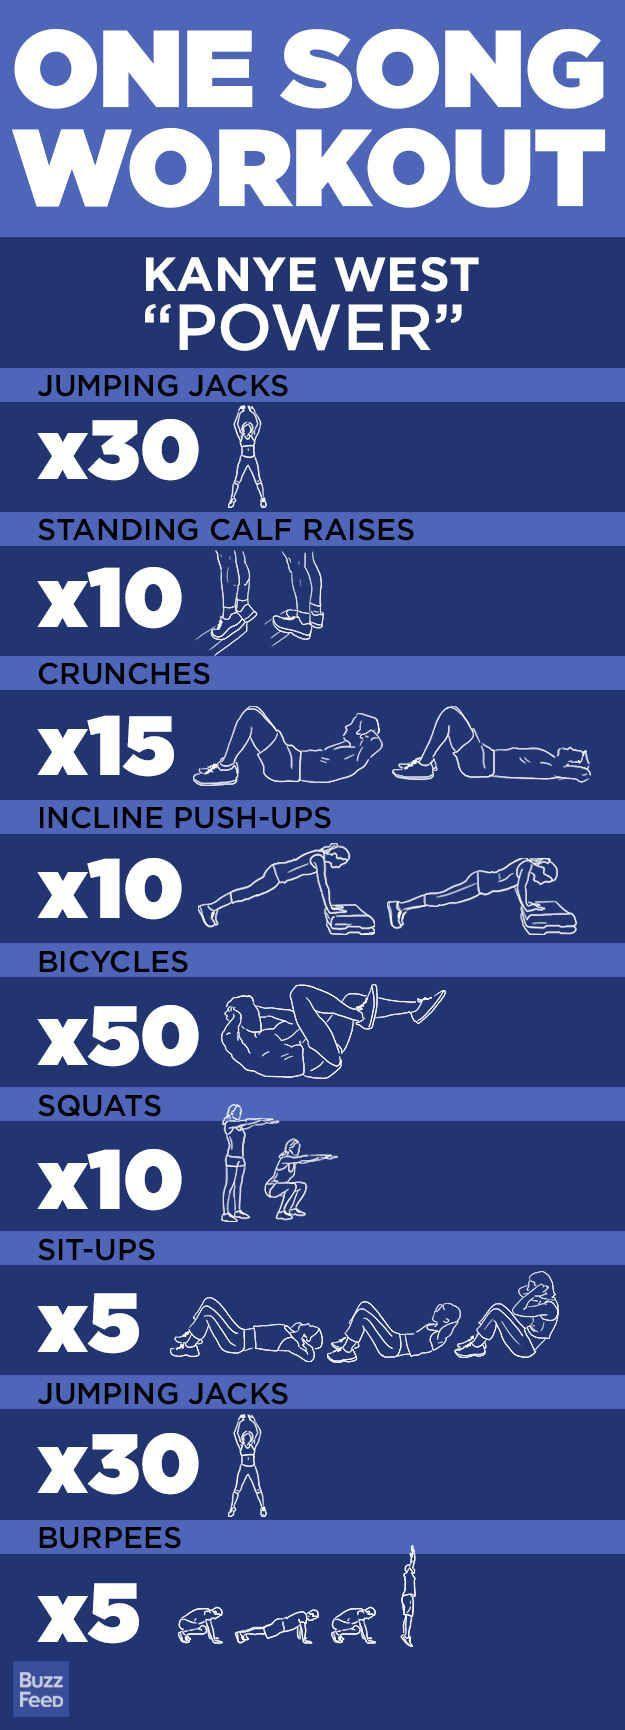 so many reasons why I workout -